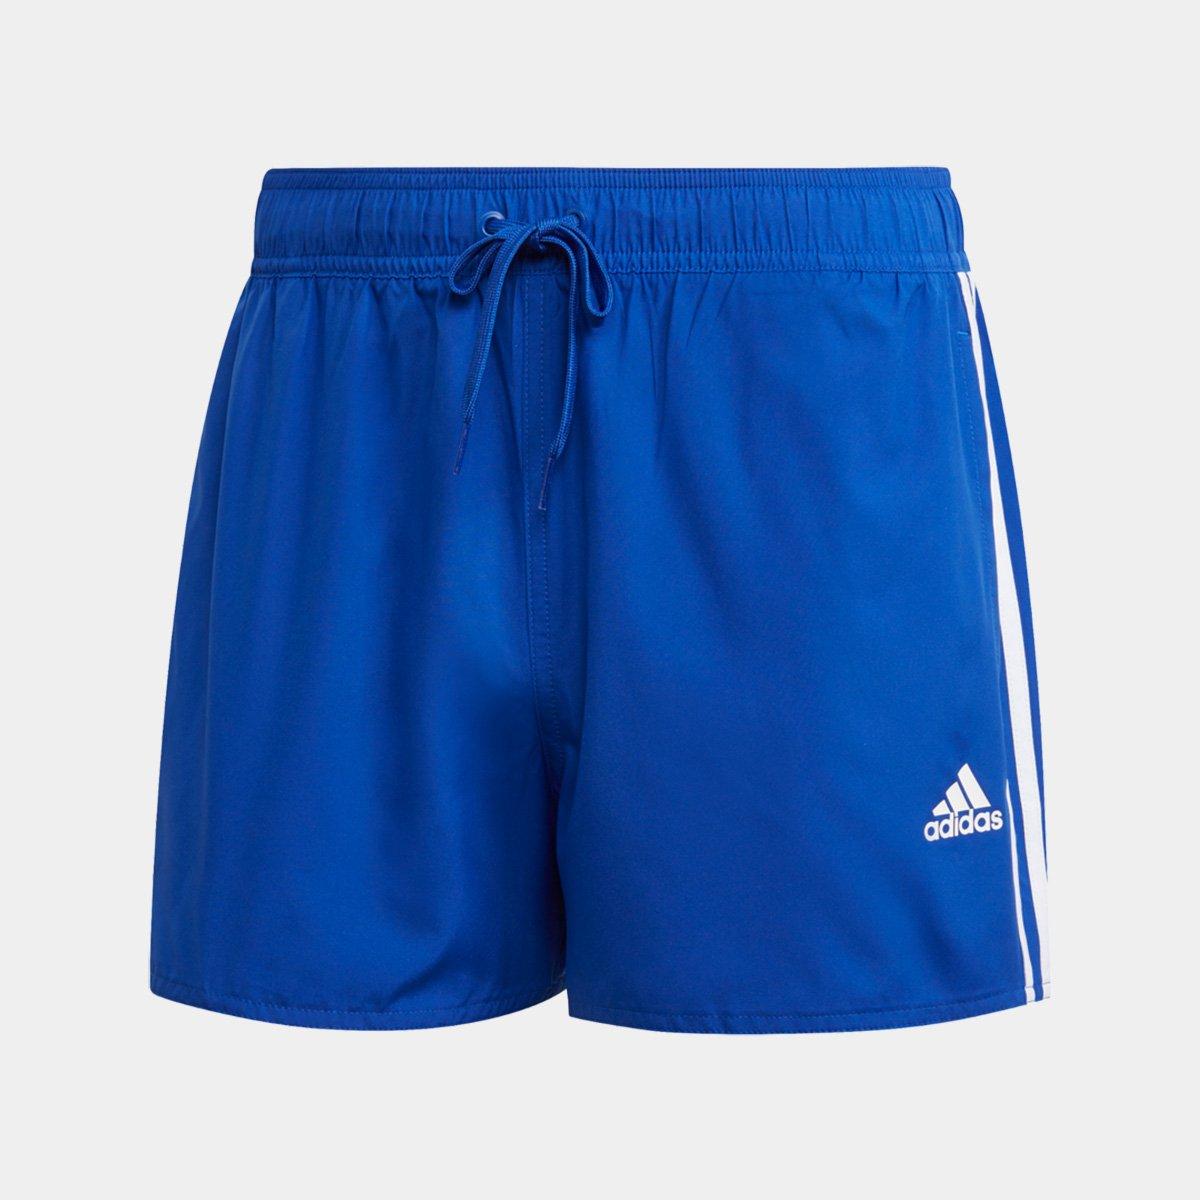 Short Adidas 3Stripes Clx Vsl Masculino